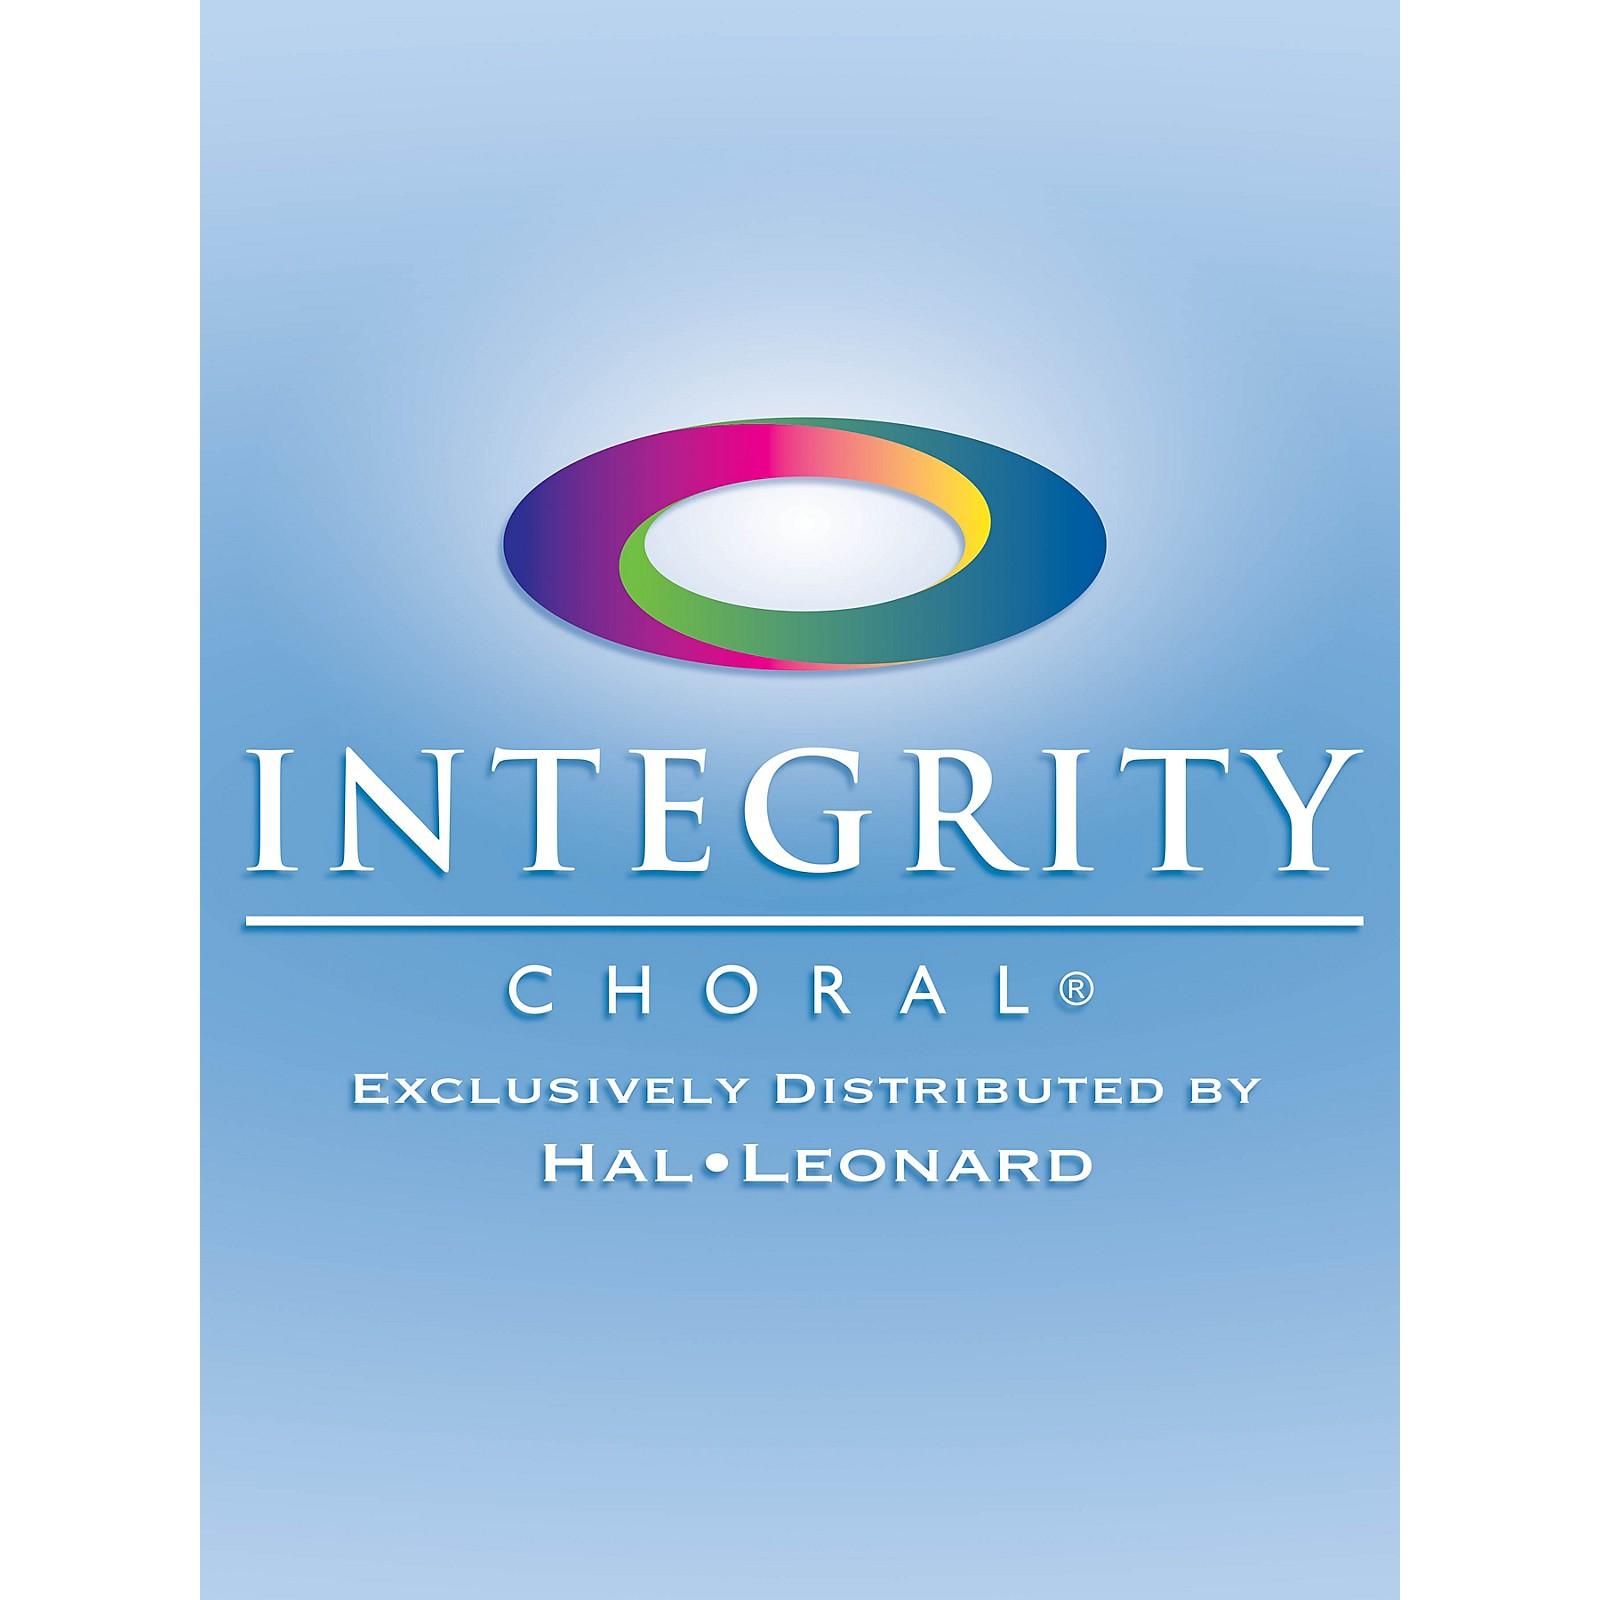 Integrity Choral Made Me Glad IPAKO Arranged by BJ Davis/Richard Kingsmore/J. Daniel Smith